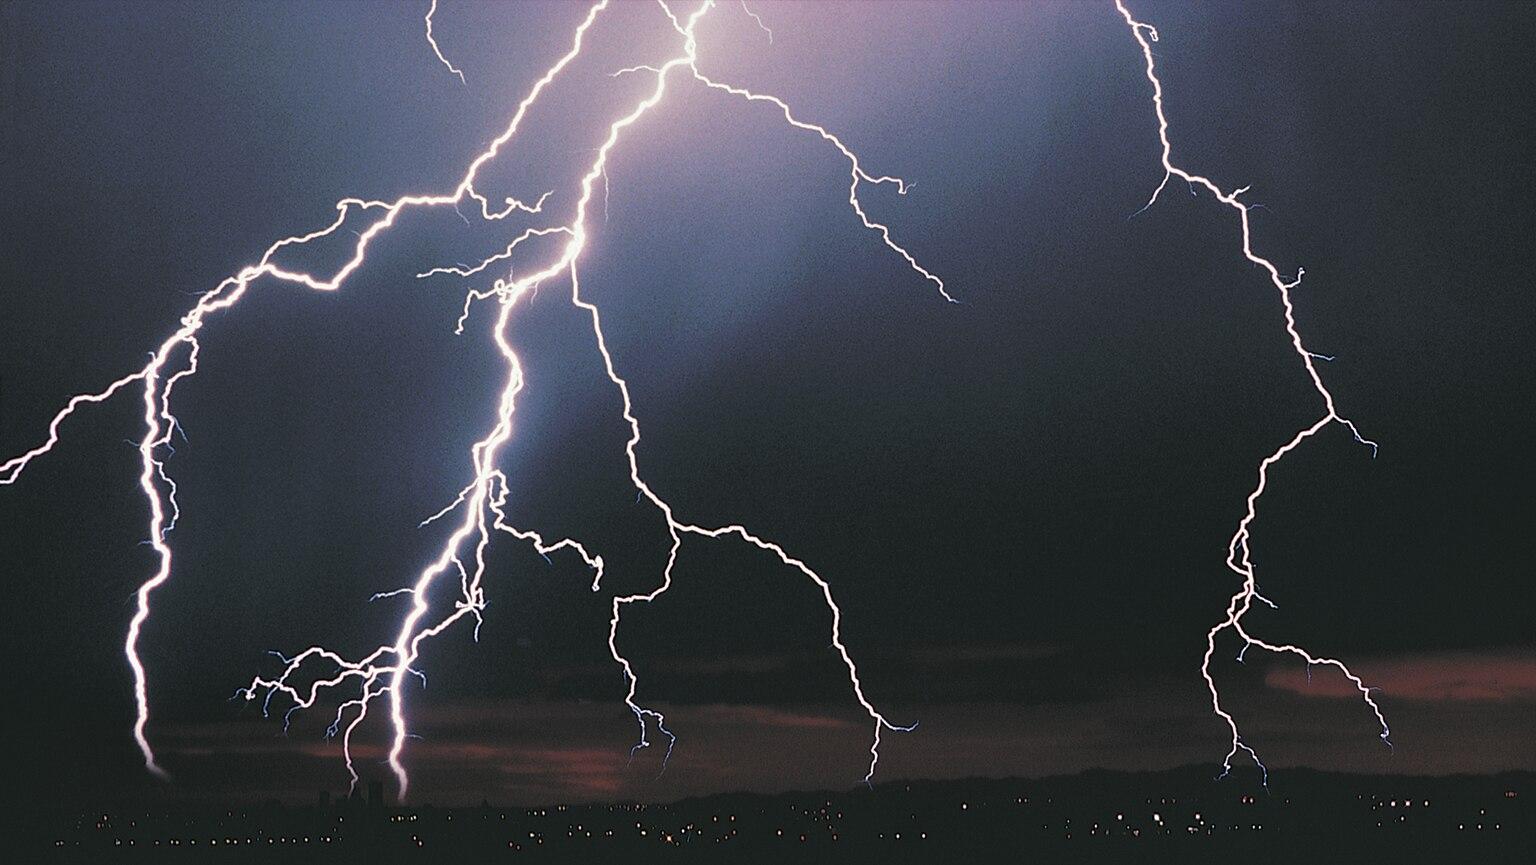 night sky clouds lightning forest HD wallpaper